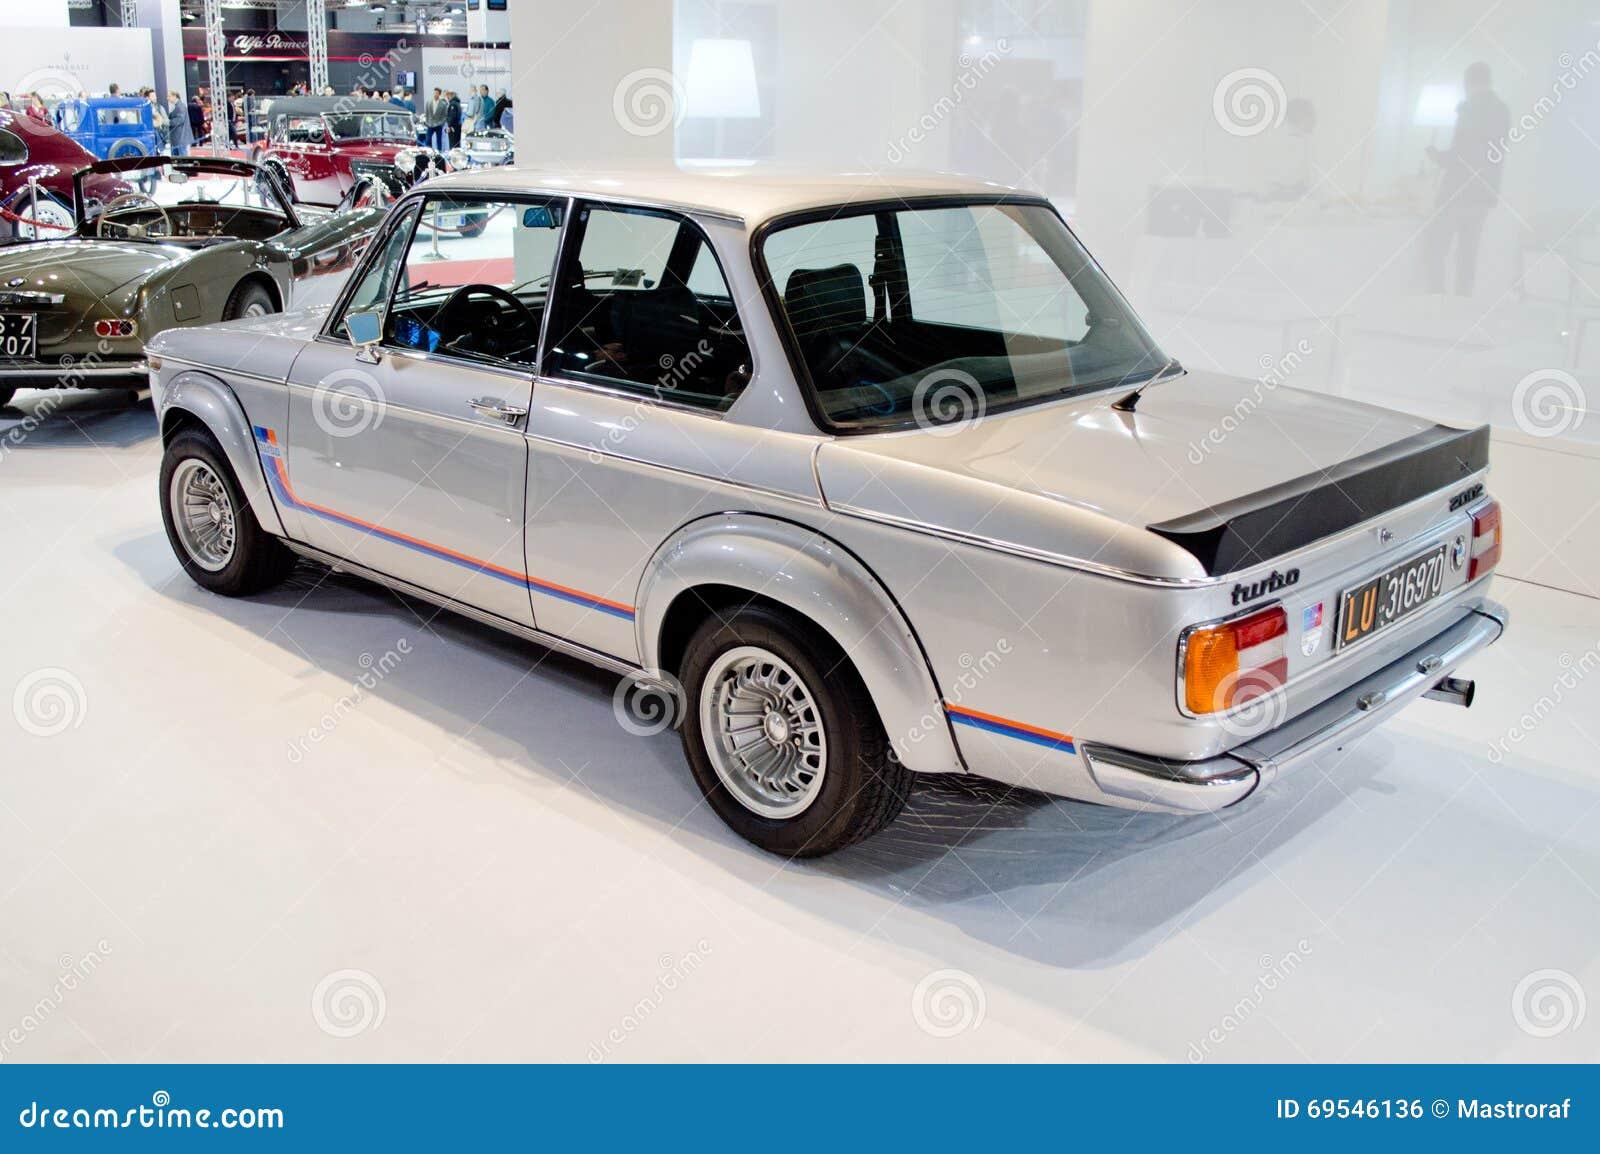 BMW turbo bmw 2002 : BMW 2002 Turbo At Milano Autoclassica 2016 Editorial Photo - Image ...